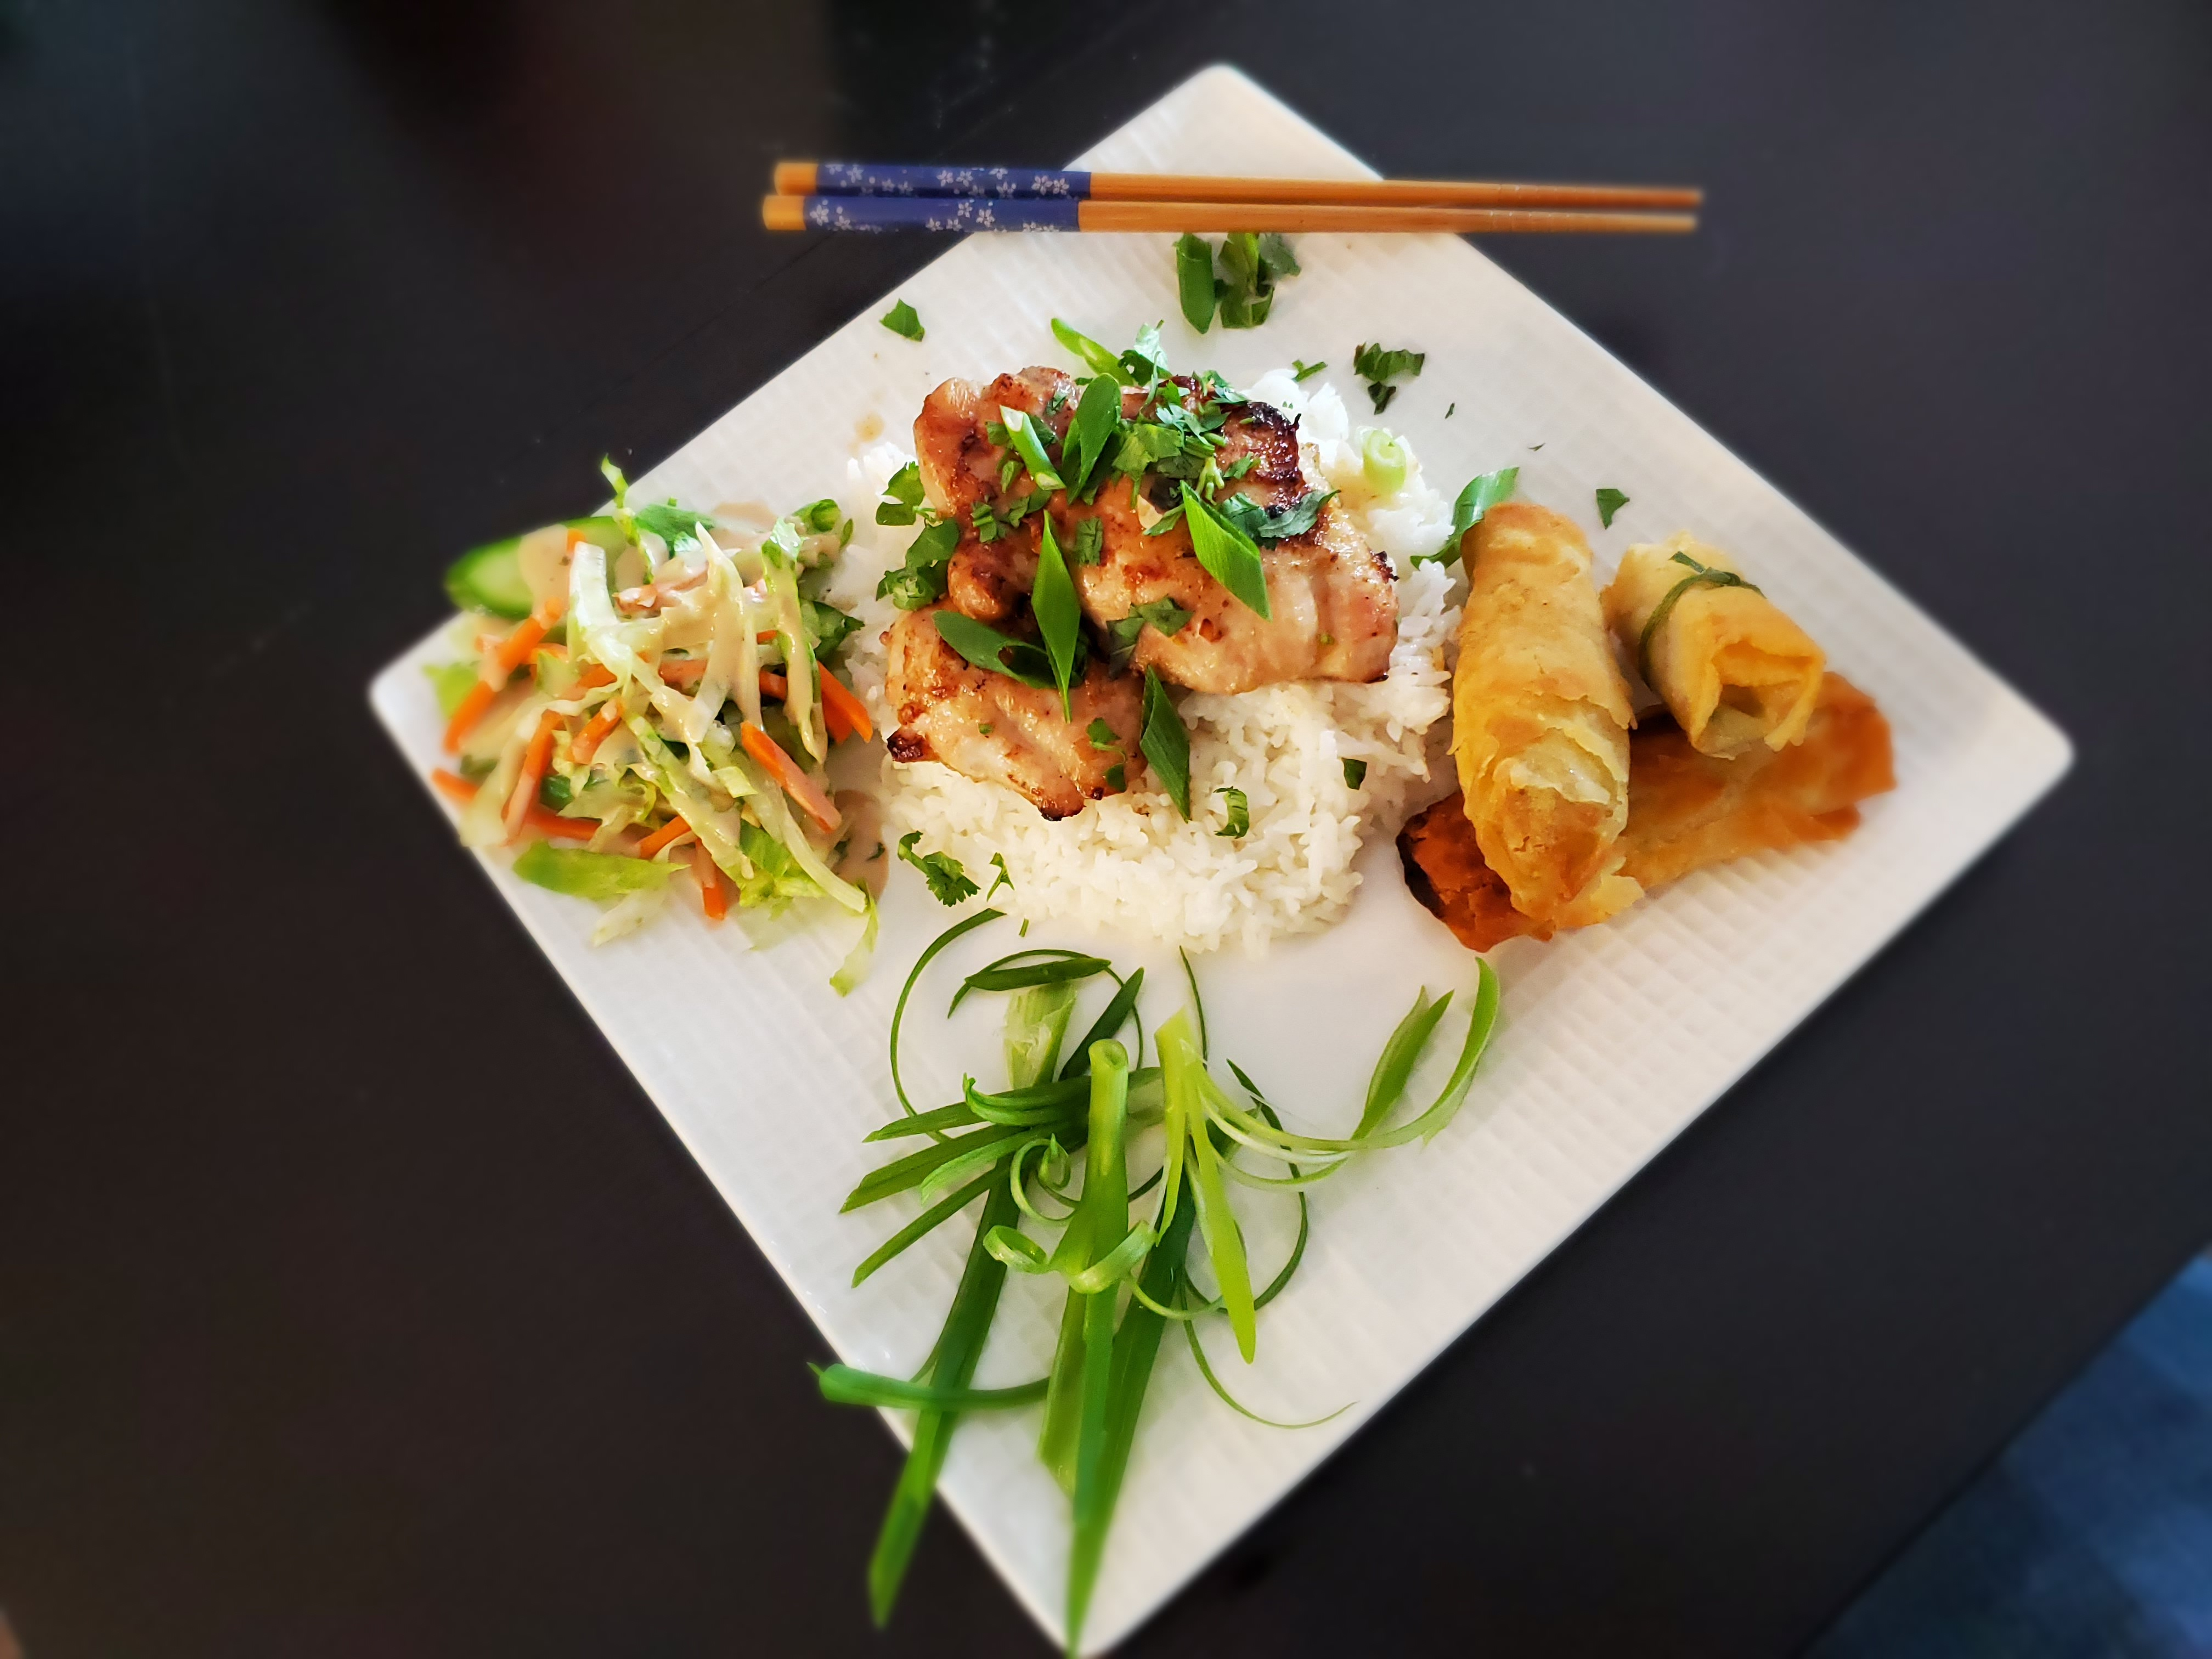 Vietnamese Grilled Lemongrass Chicken Nicholas Chou